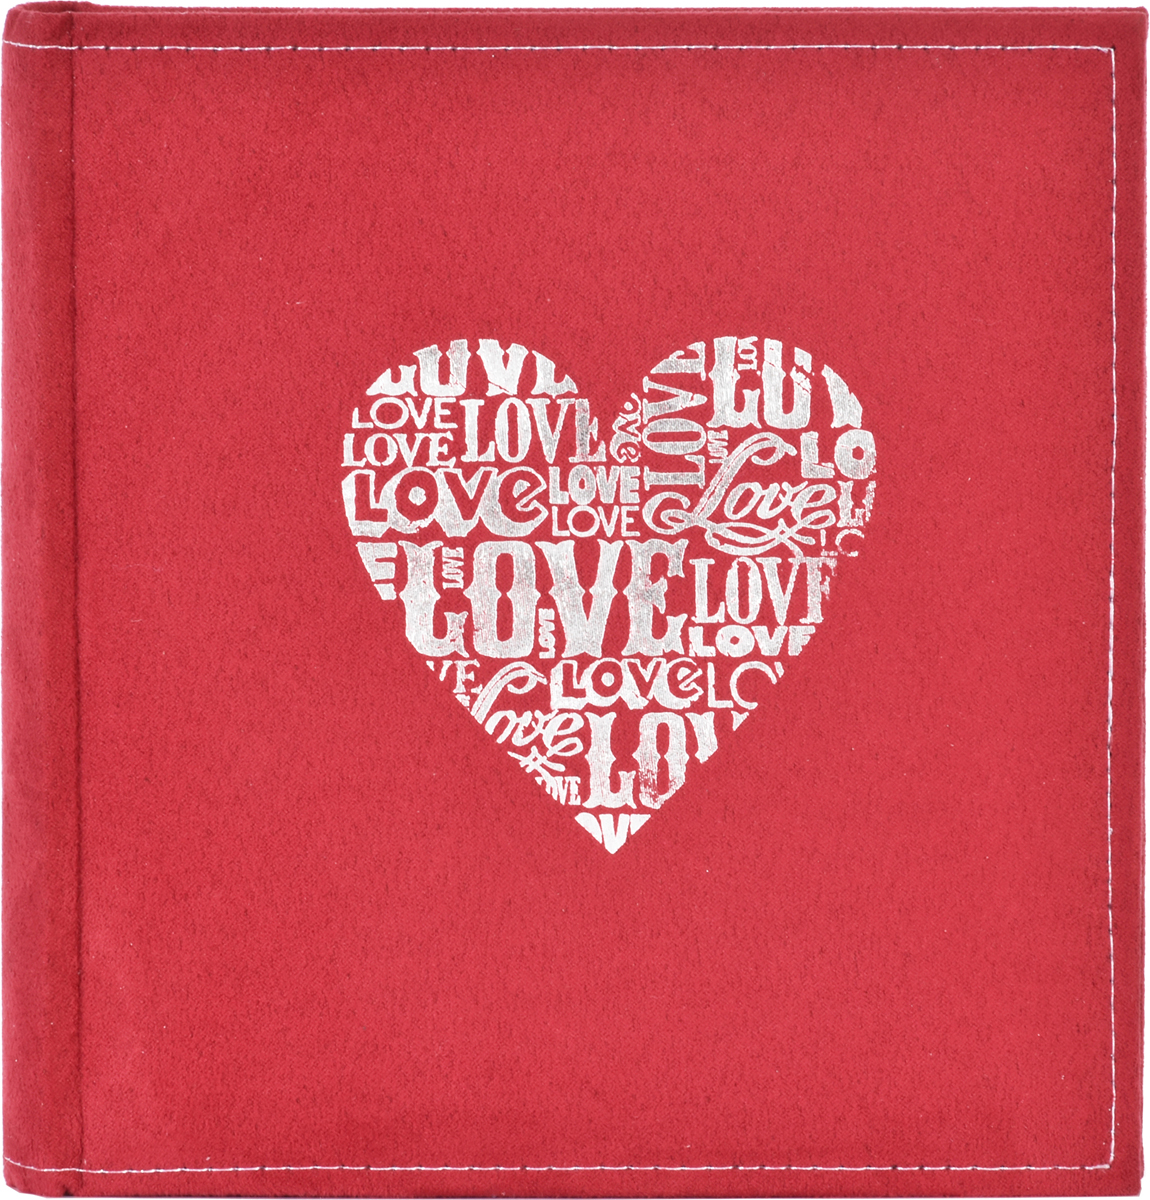 Фотоальбом Innova Suedette Heart Bookbound, 200 фотографий, 10 х 15 смQ8908444